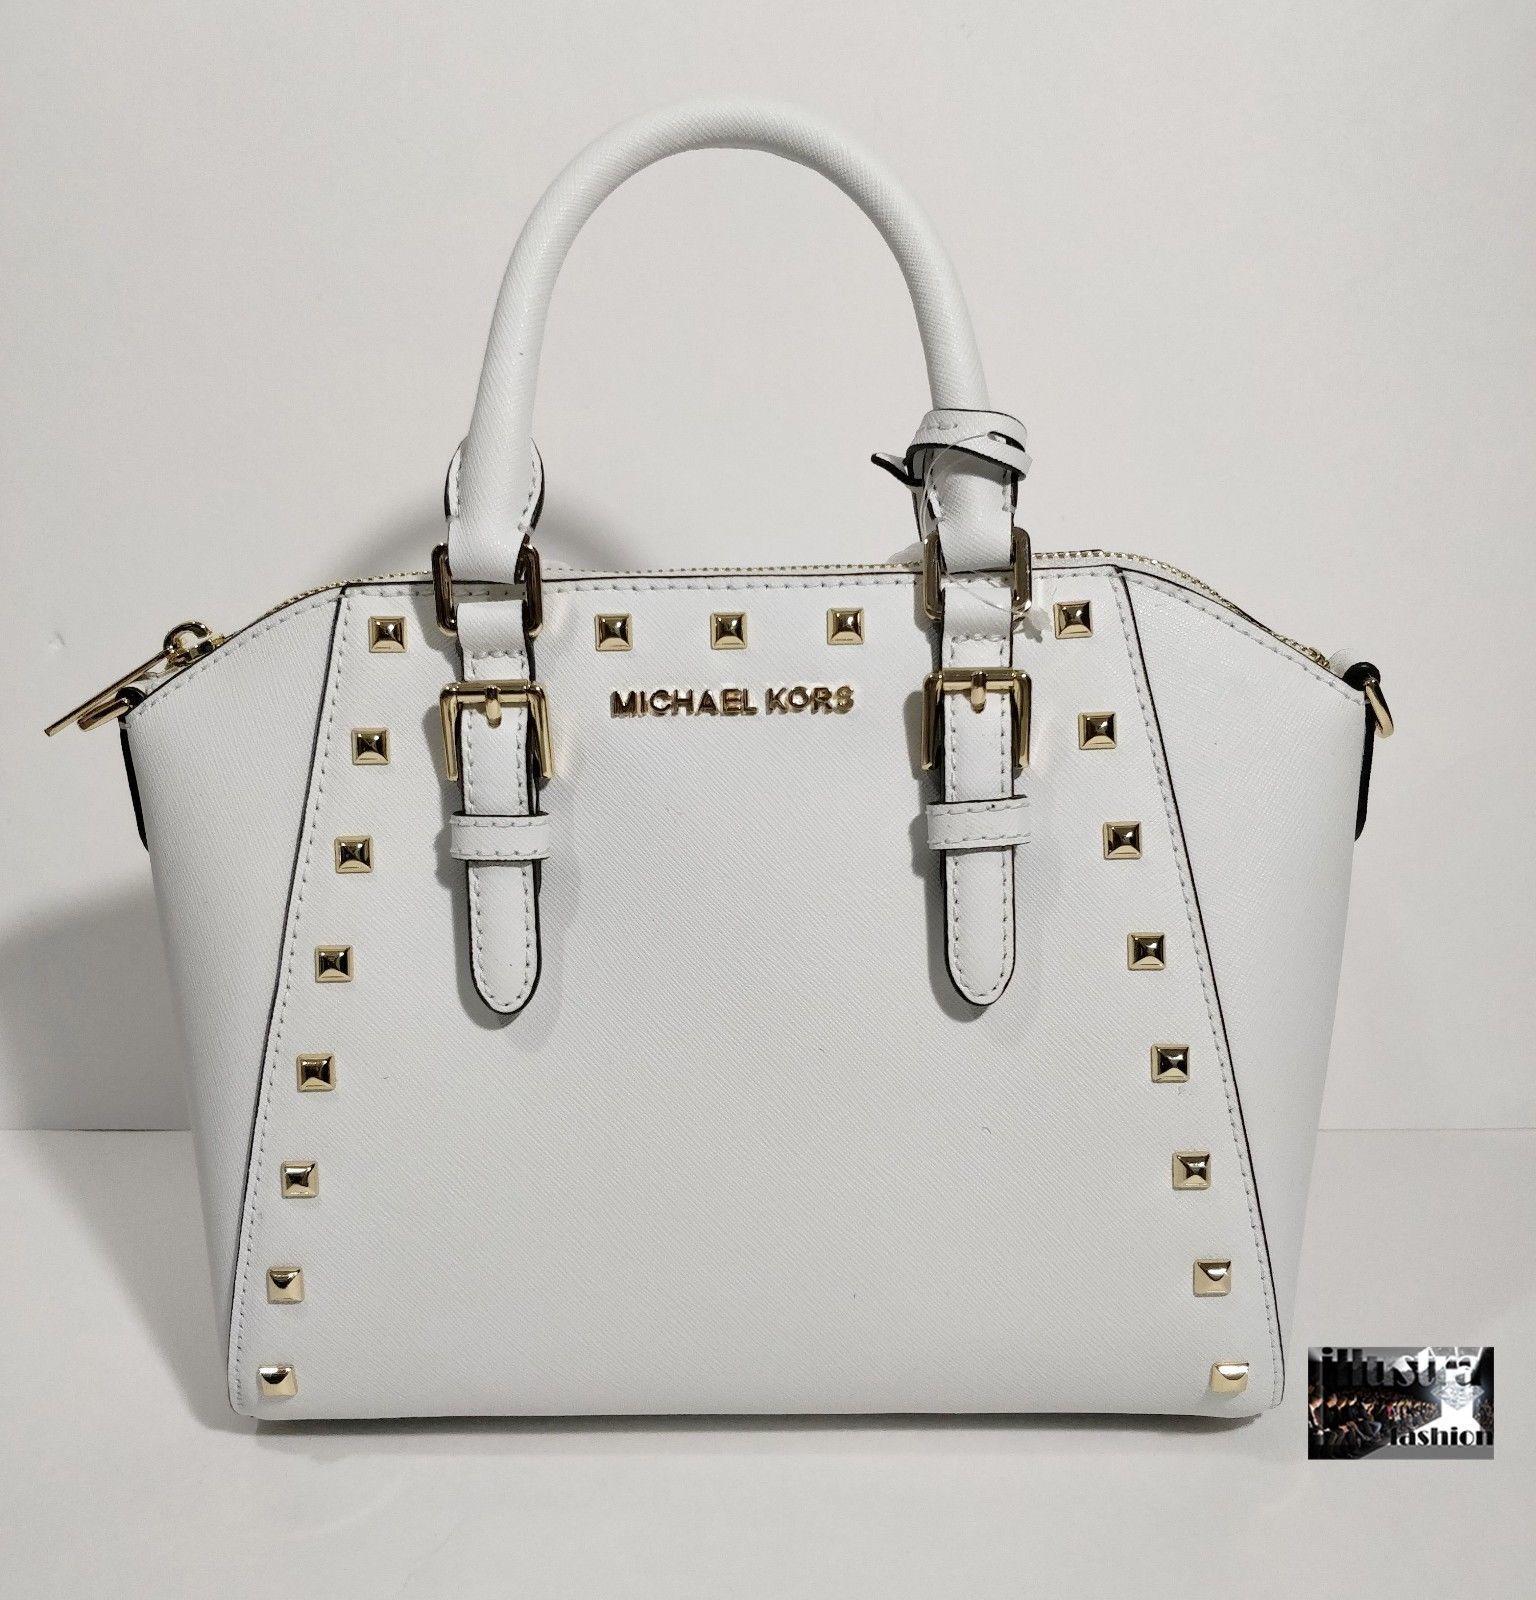 b5119e4ac92b NWT $328 Michael Kors Ciara White Saffiano Leather Studded Satchel Crossbody  Bag